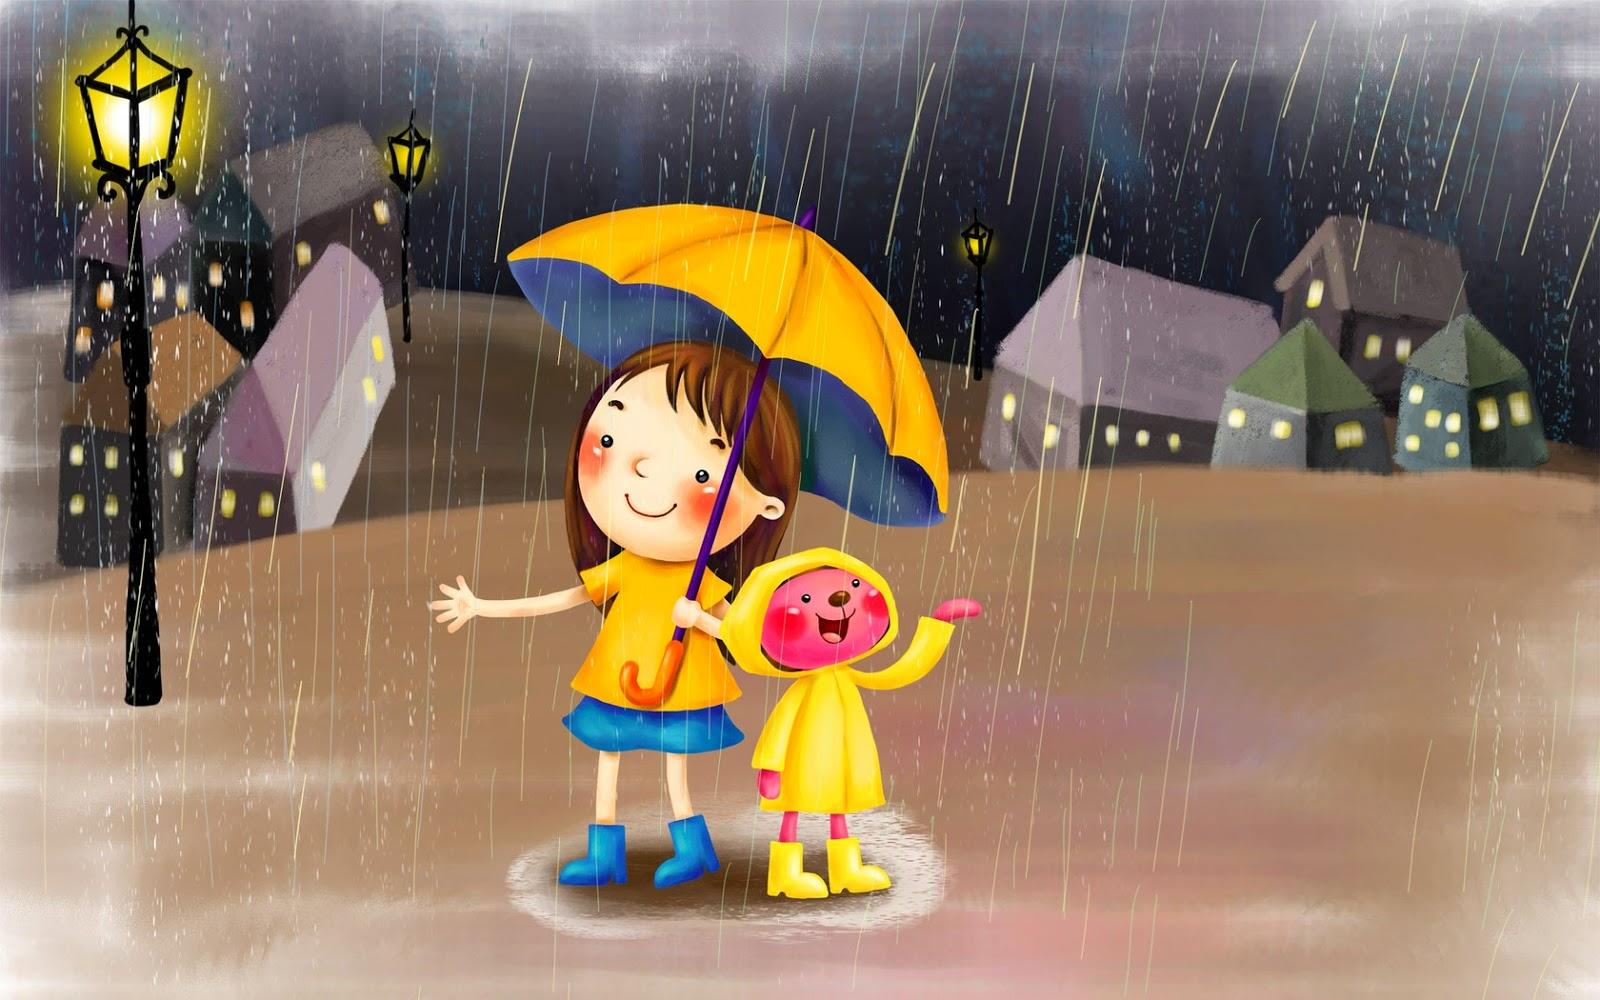 GAMBAR HUJAN KARTUN LUCU Gambar Animasi Hujan Lebat Bergerak